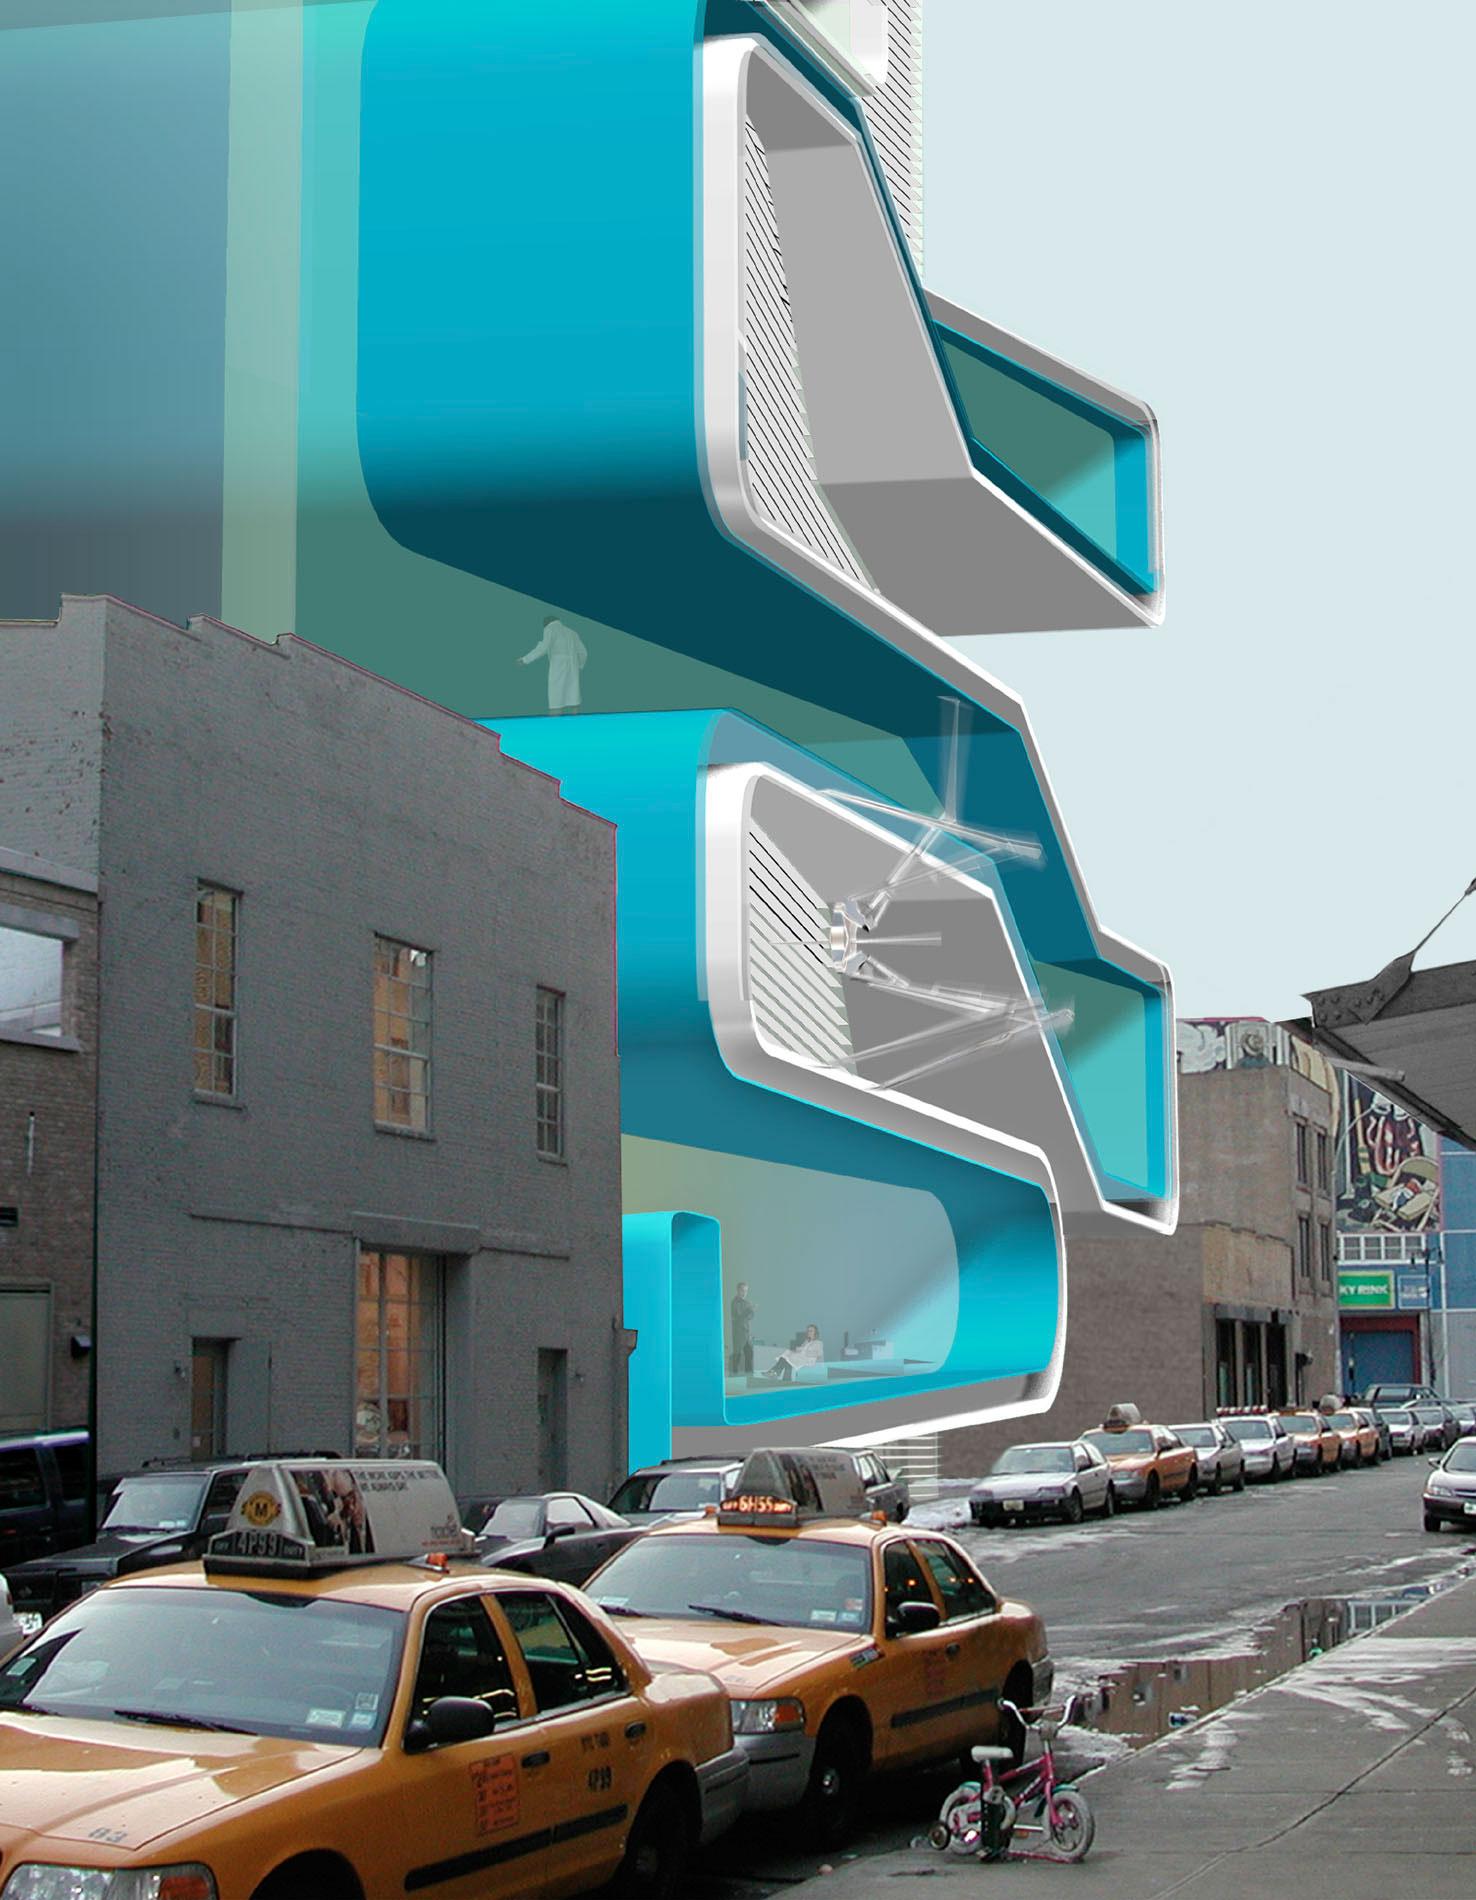 Rendering of Diller Scofidio + Renfro's Eyebeam Museum of Art and Technology, 2001